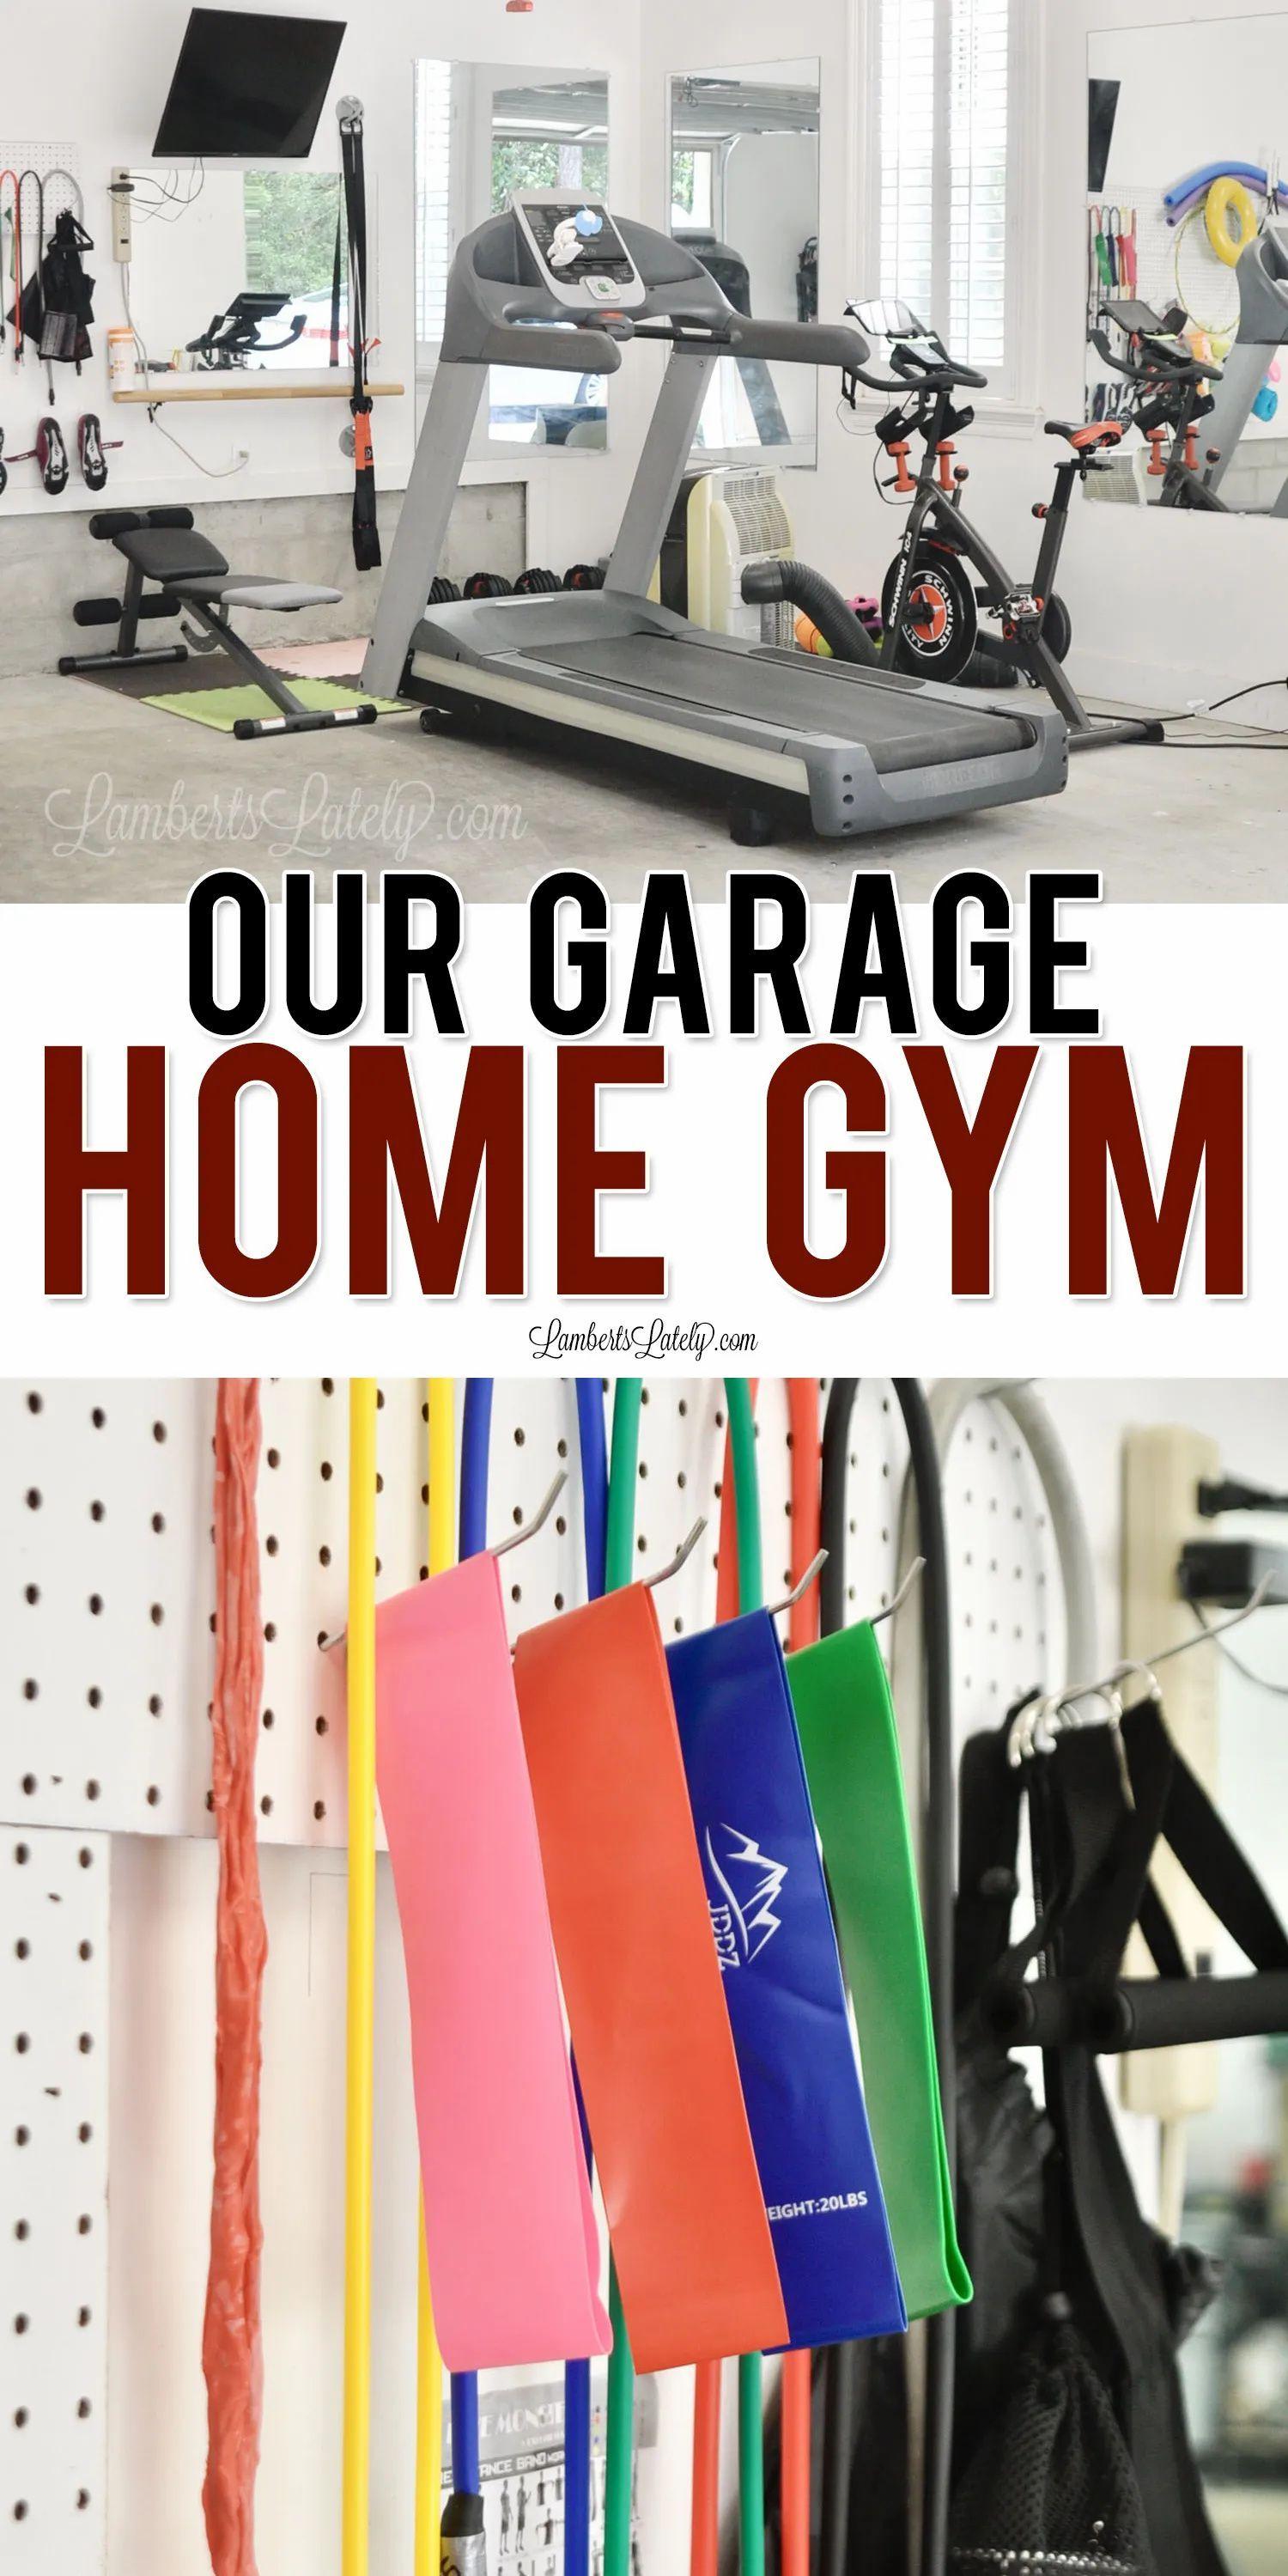 Our garage home gym in 2020 home gym gym local gym